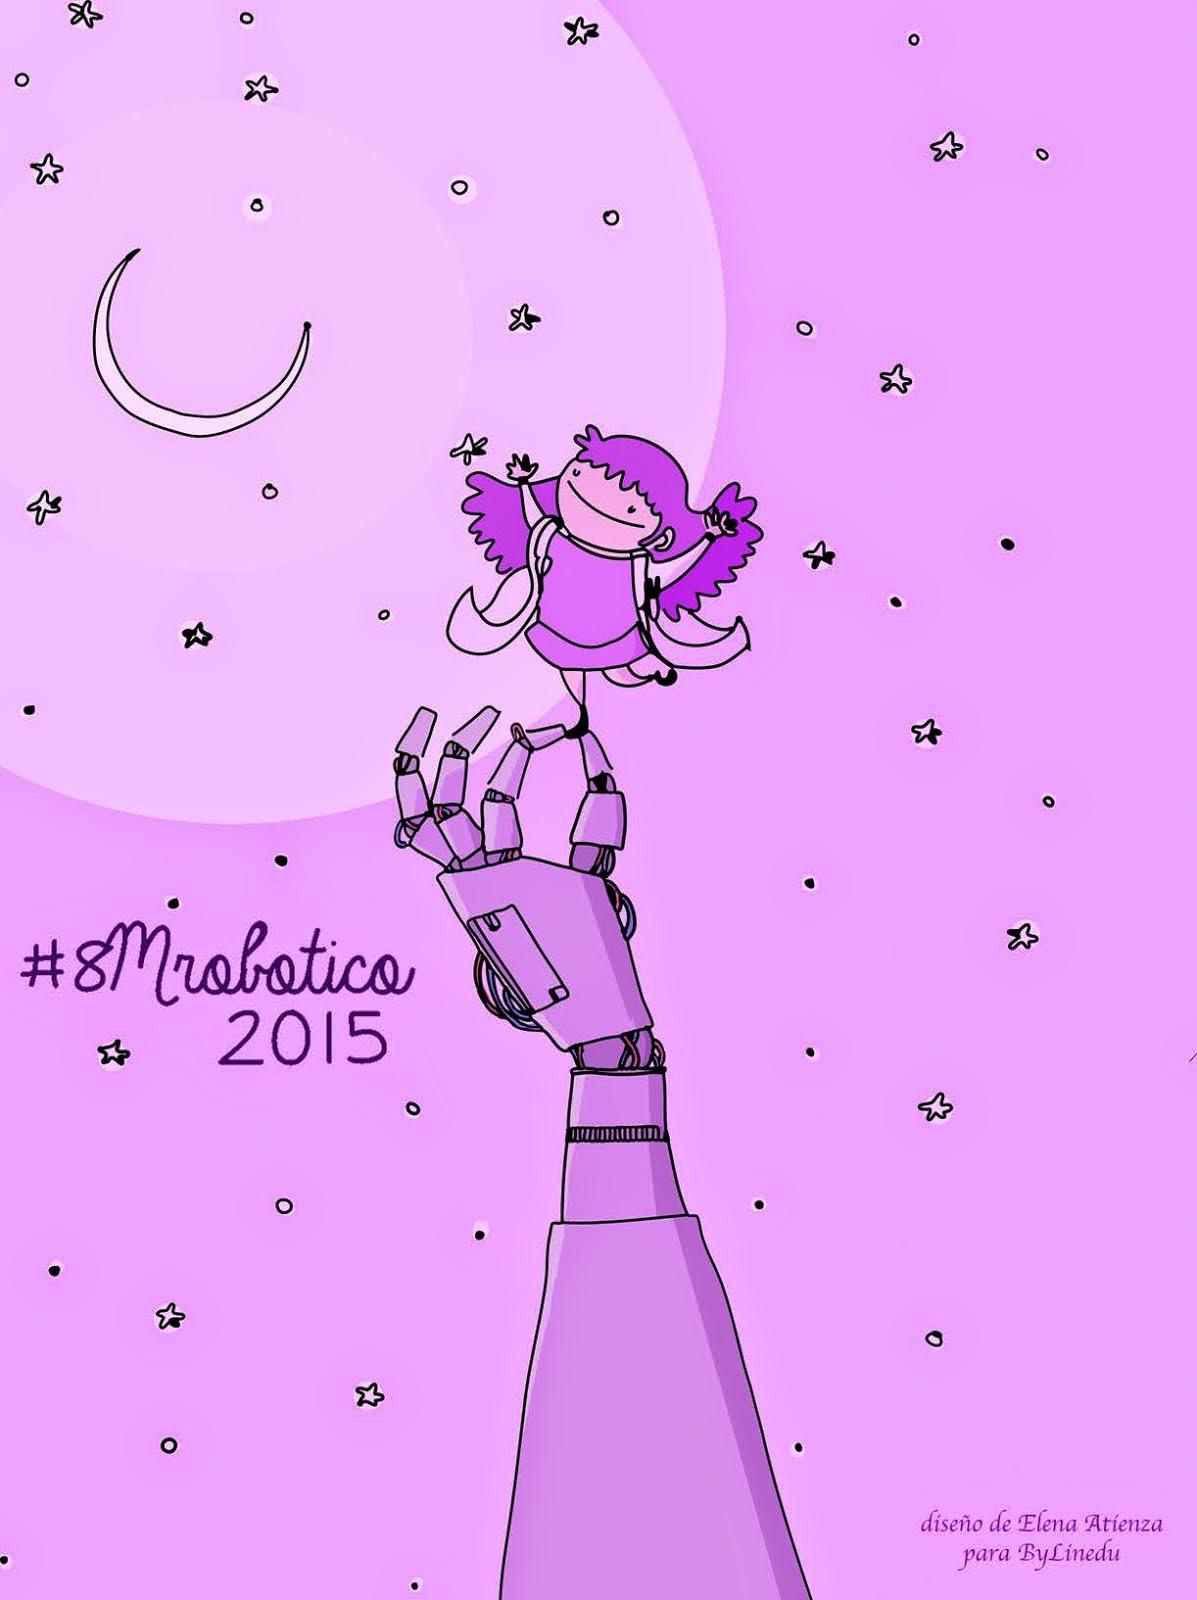 #8MRobótico 2015